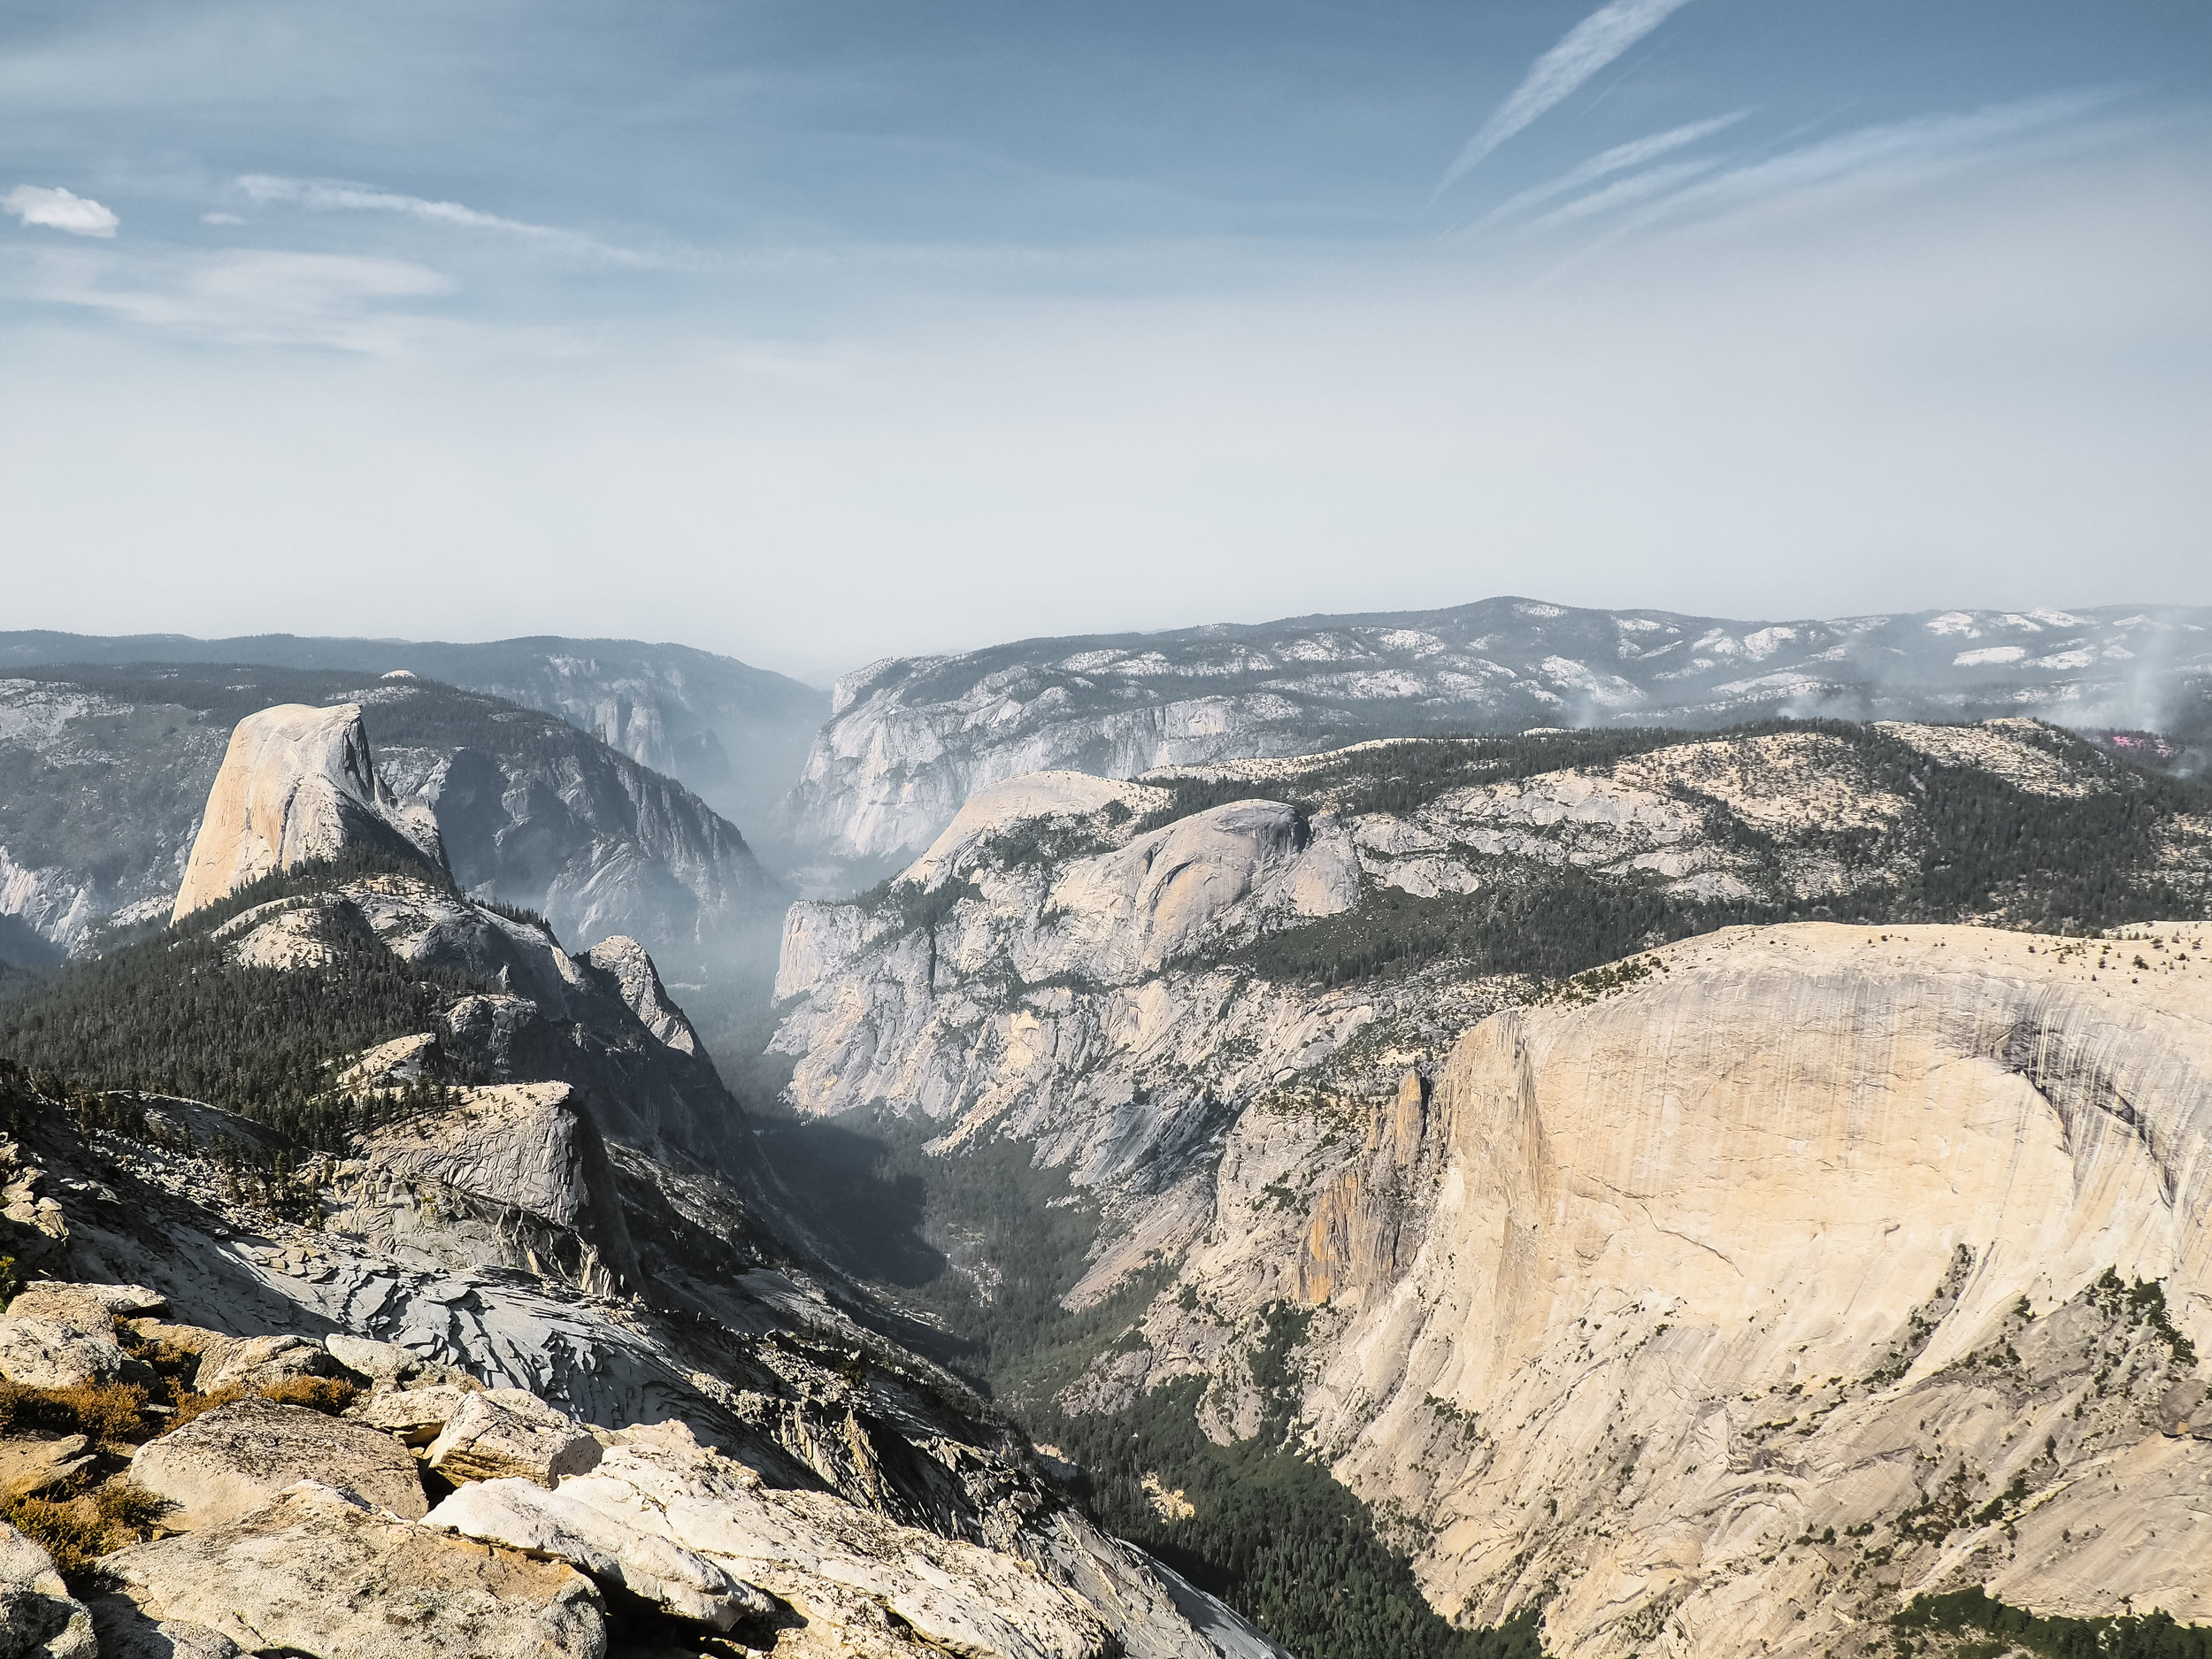 CLoud's Rest looking towards Yosemite Valley